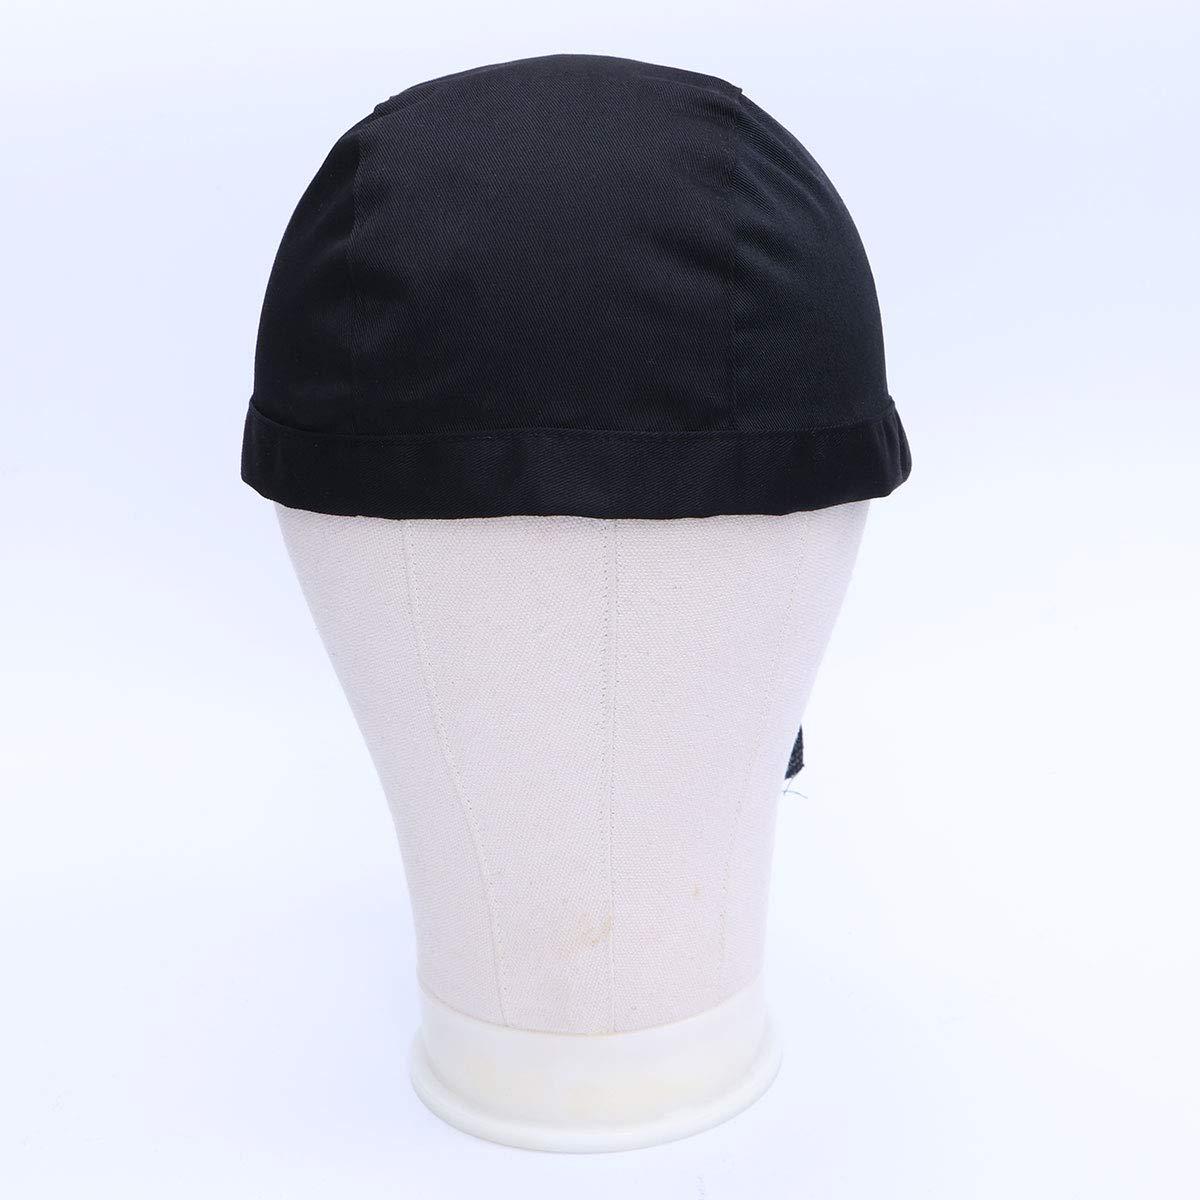 Black Healifty Chefs Head Chefs Hat Ideal for Chefs Hat